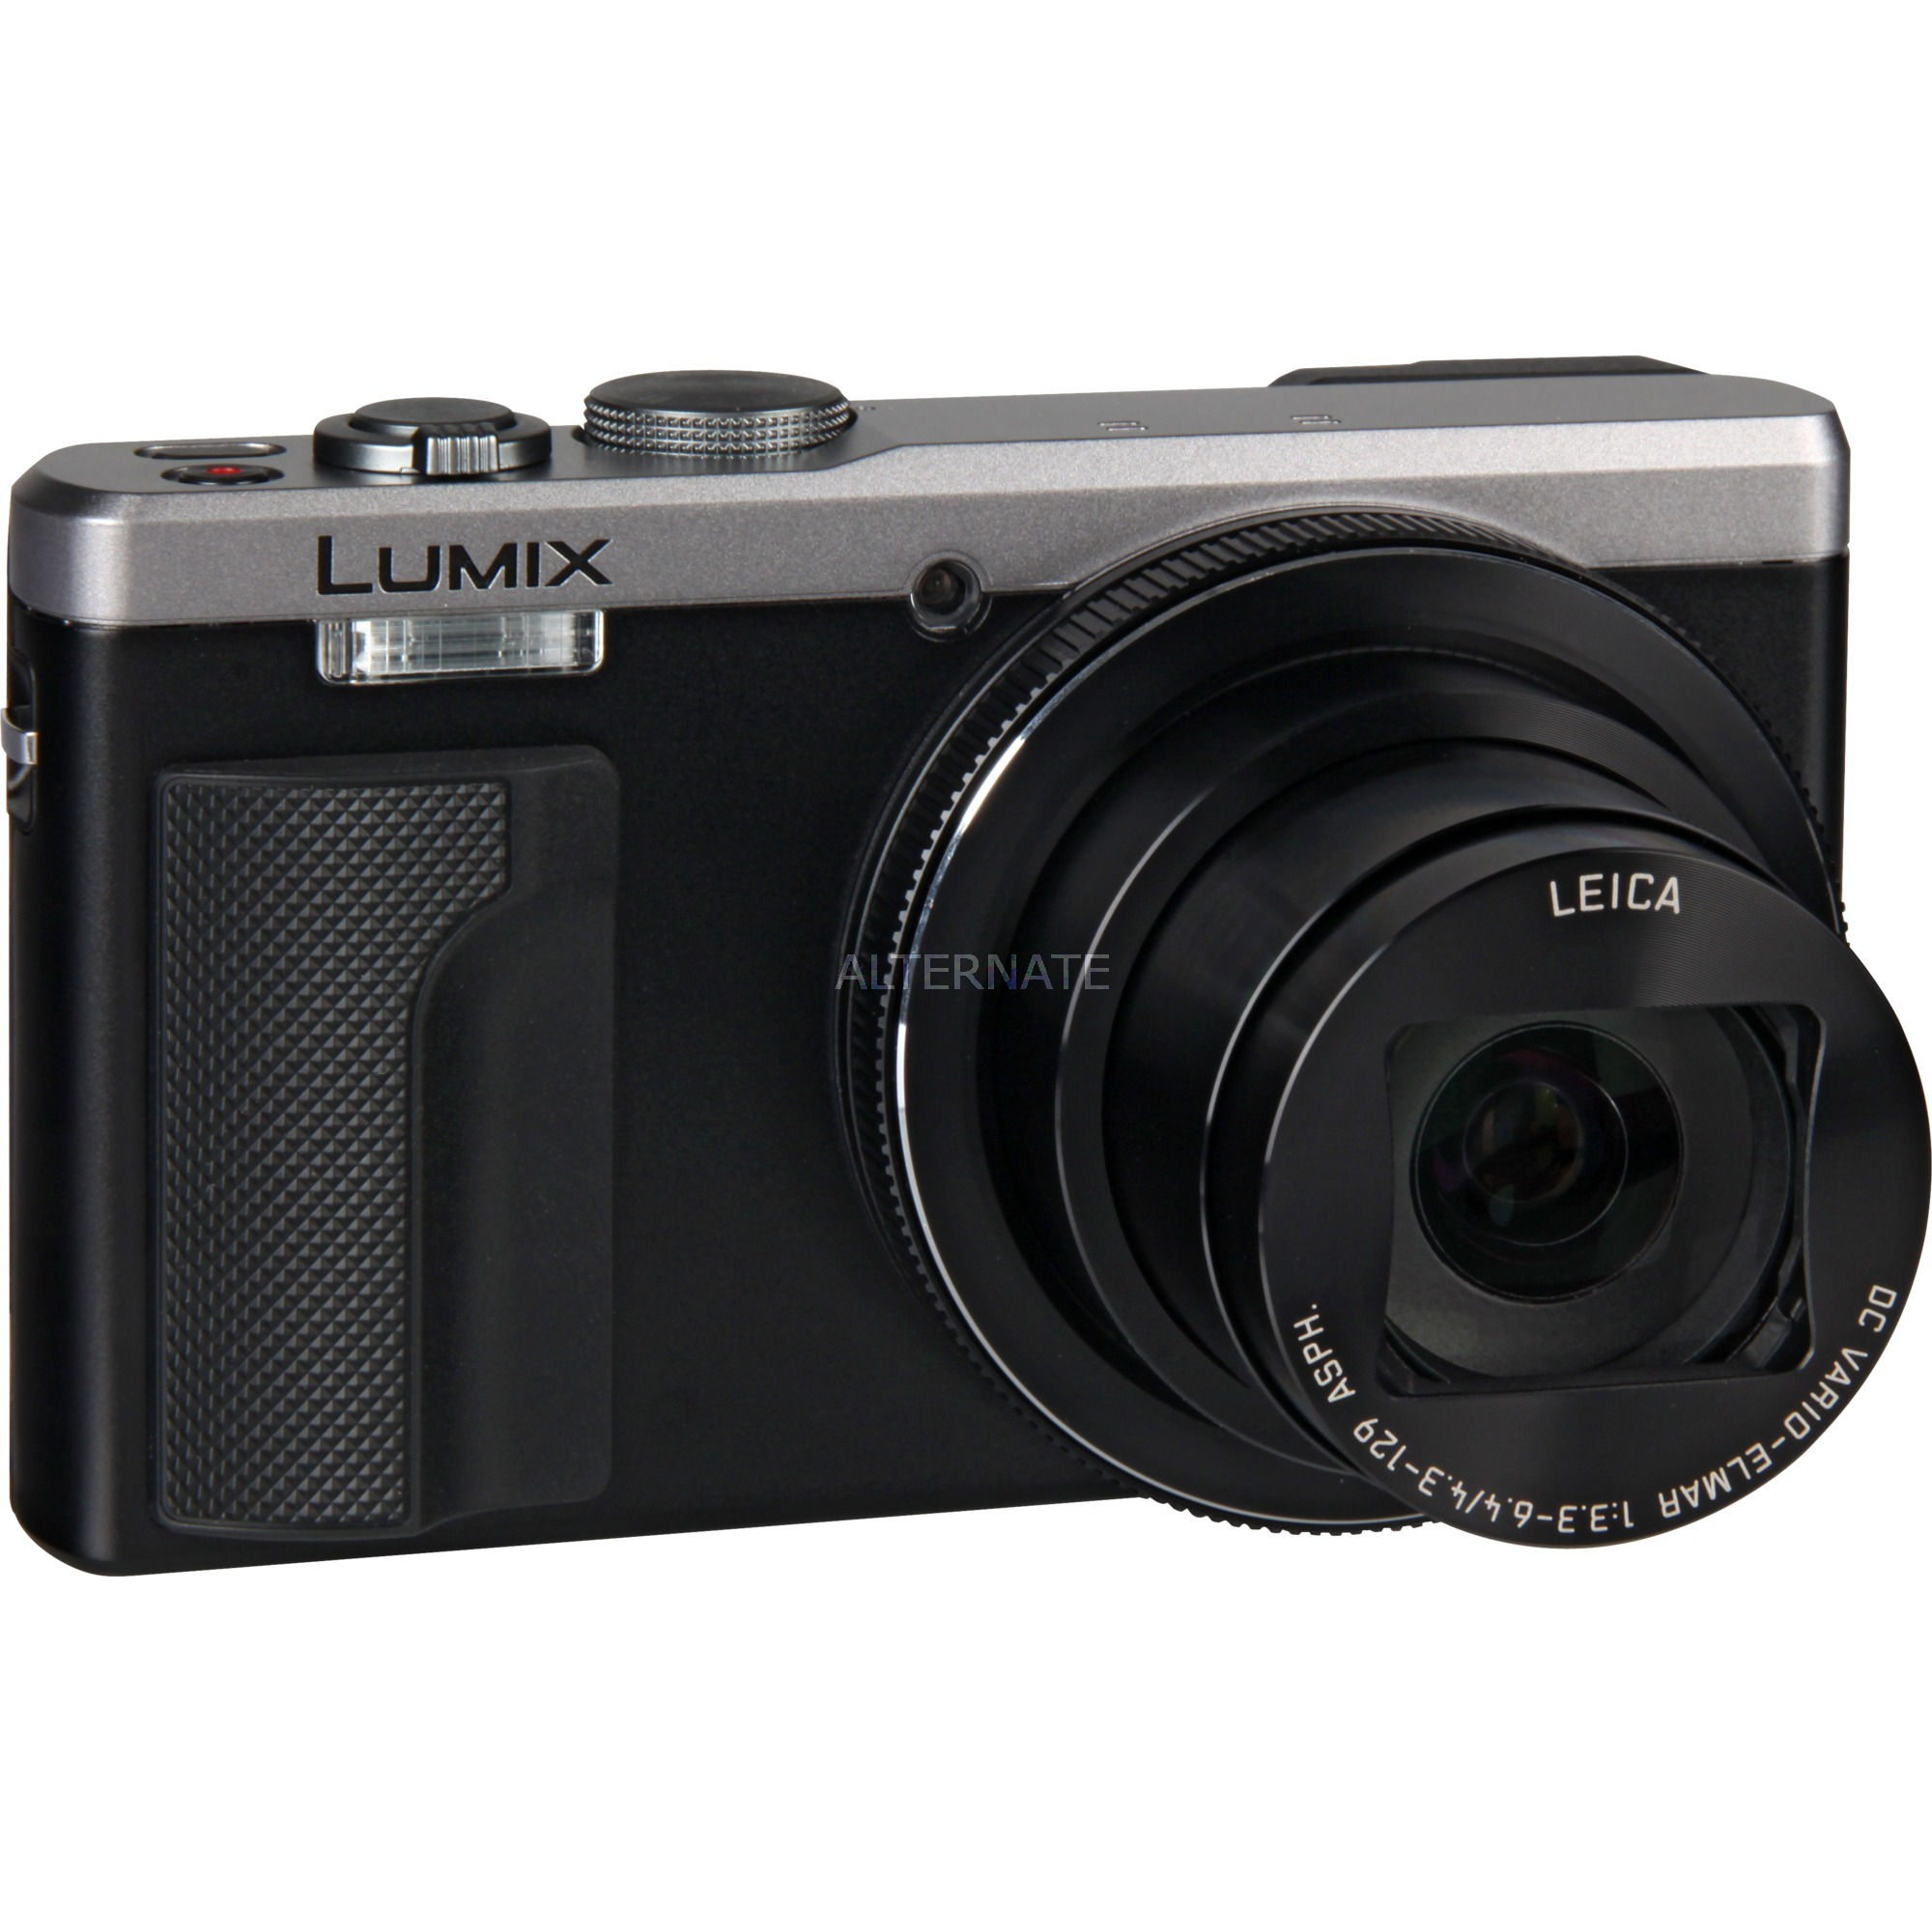 lumix-dmc-tz81-kompakt-kamera-181mp-1233-mos-4896-x-3672pixel-sort-solv-digital-kamera